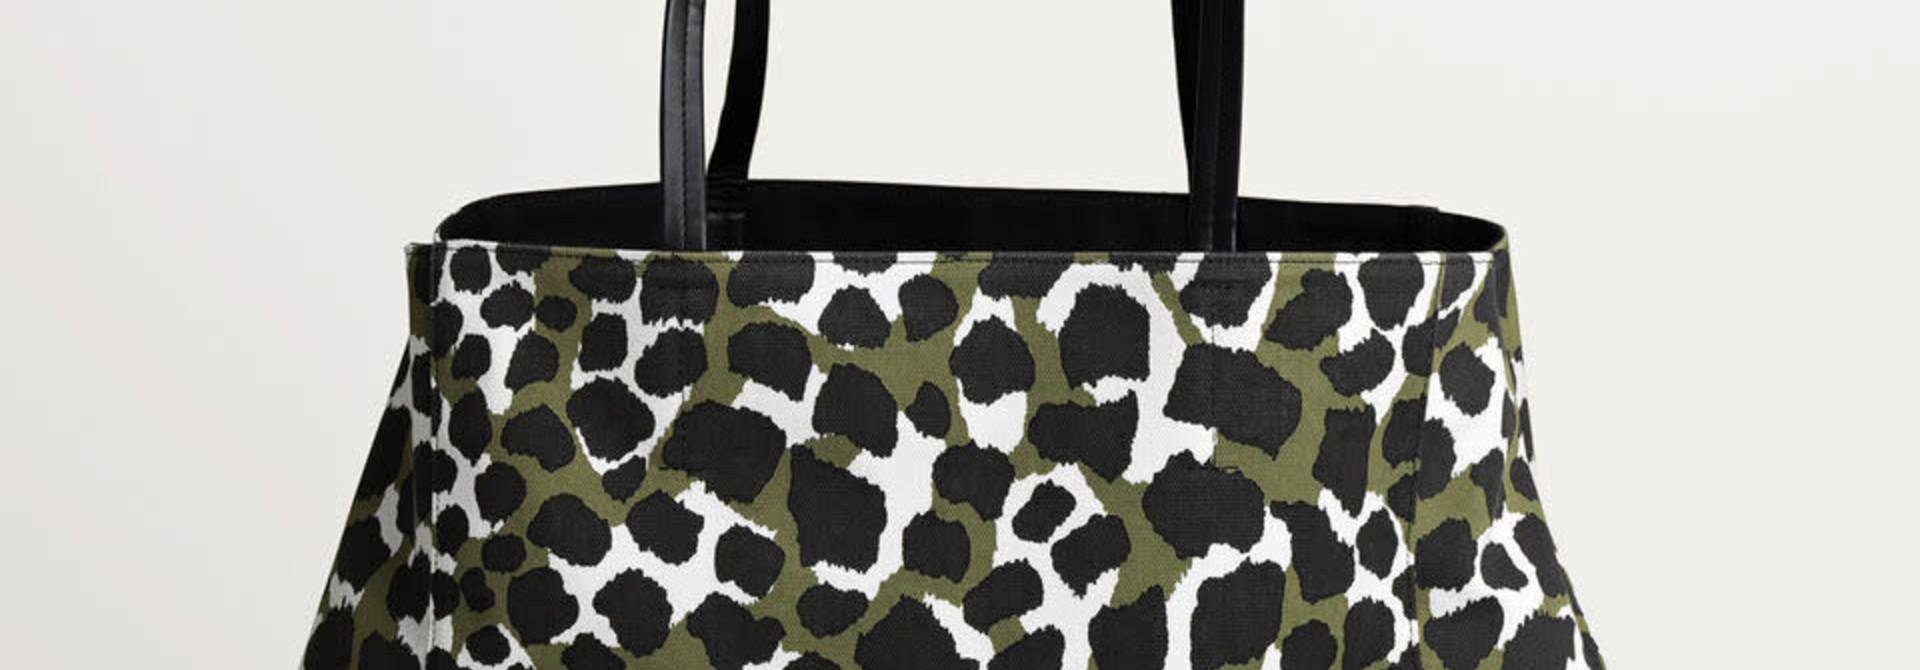 Leo tote bag By Malene Birger